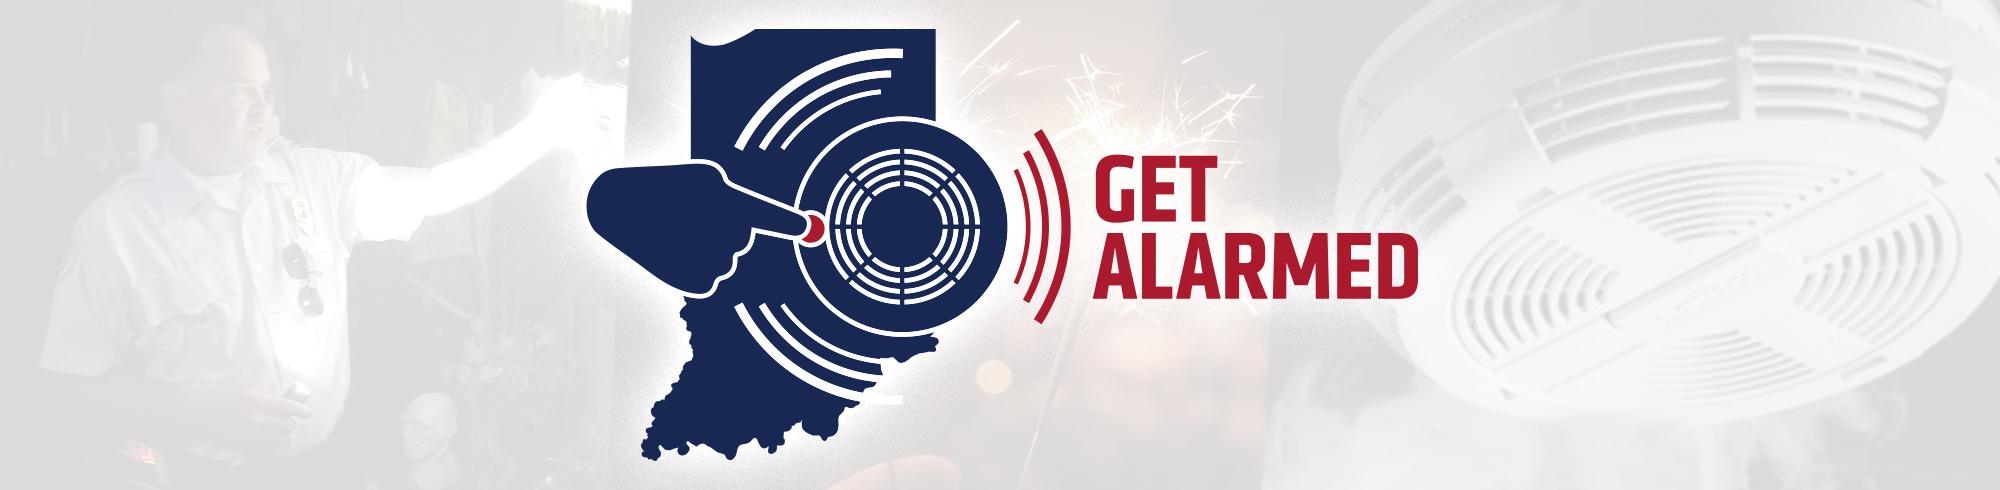 Get Alarmed Page Banner